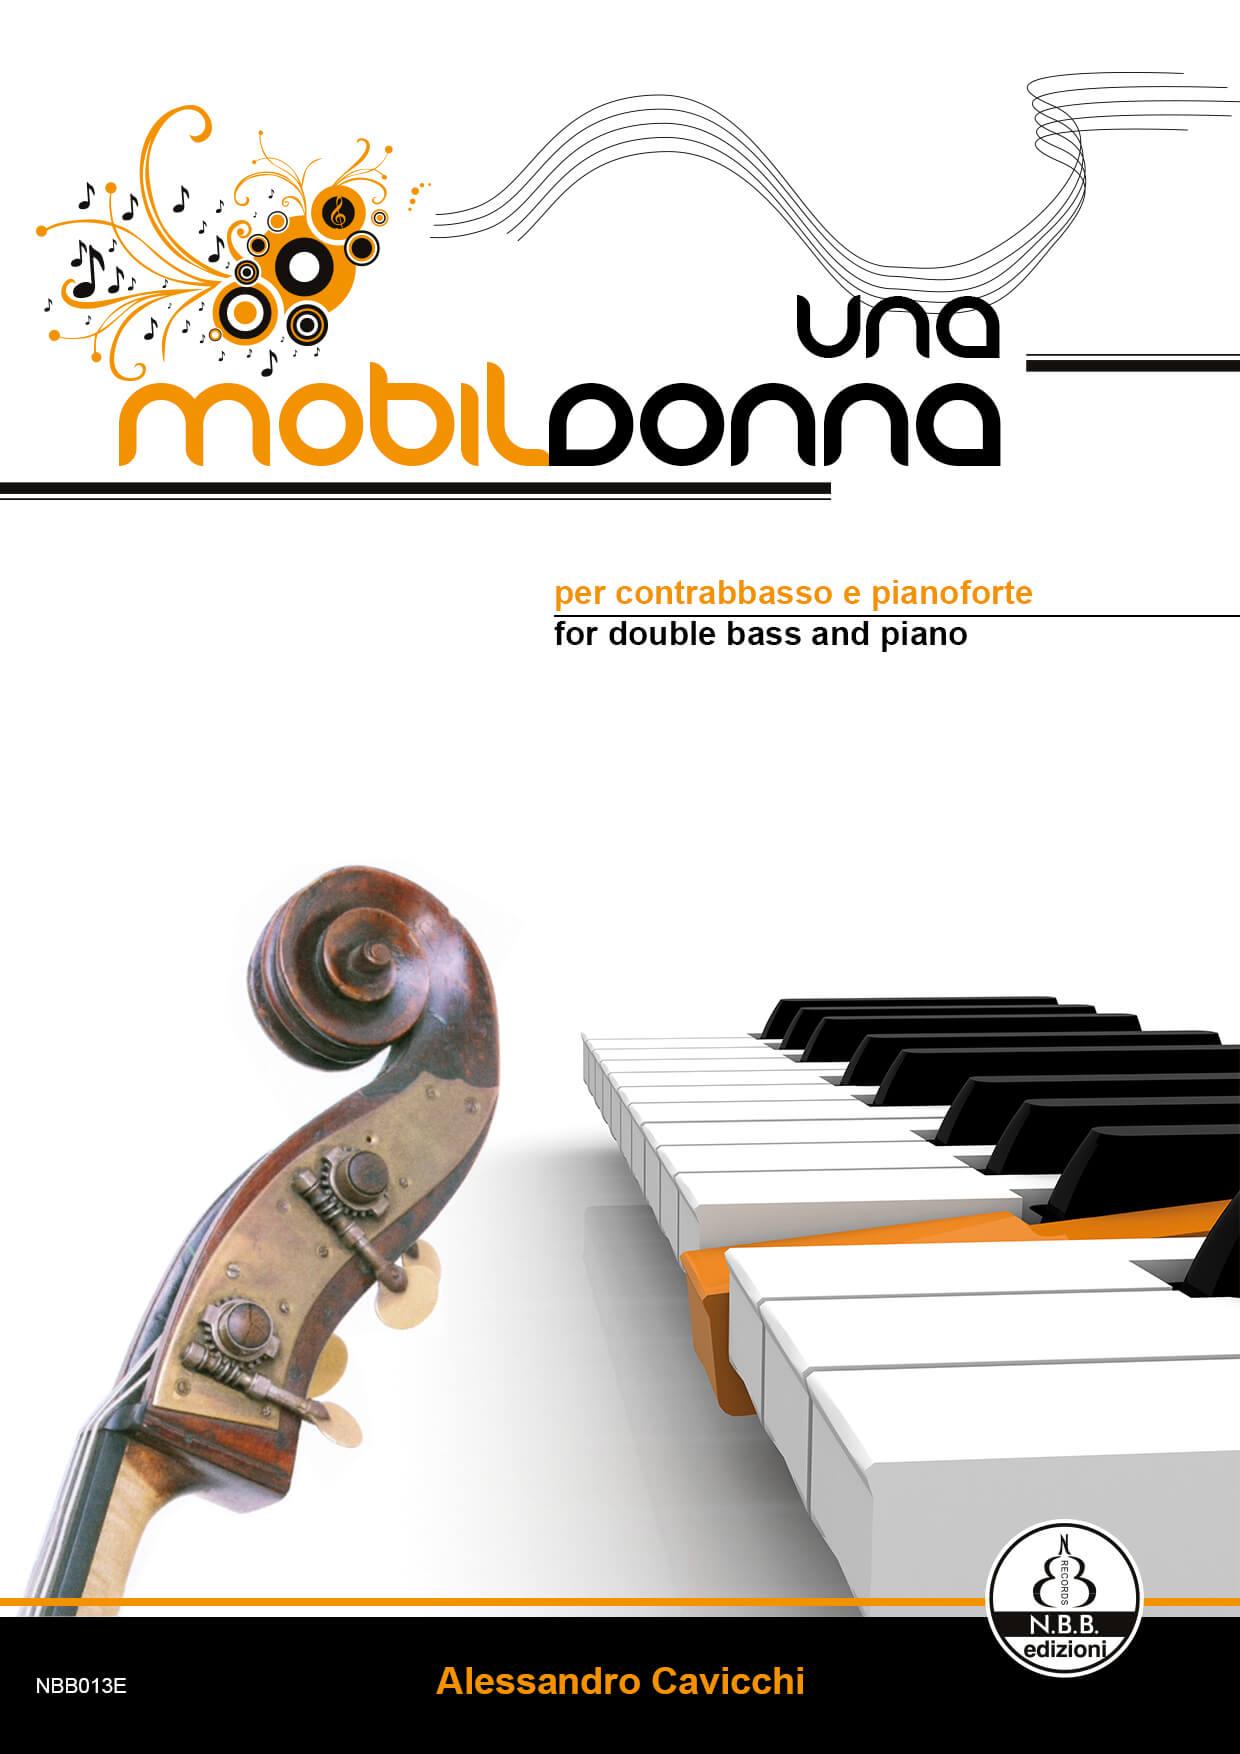 nbbrecords-mobildonna-FRONT-NBB013